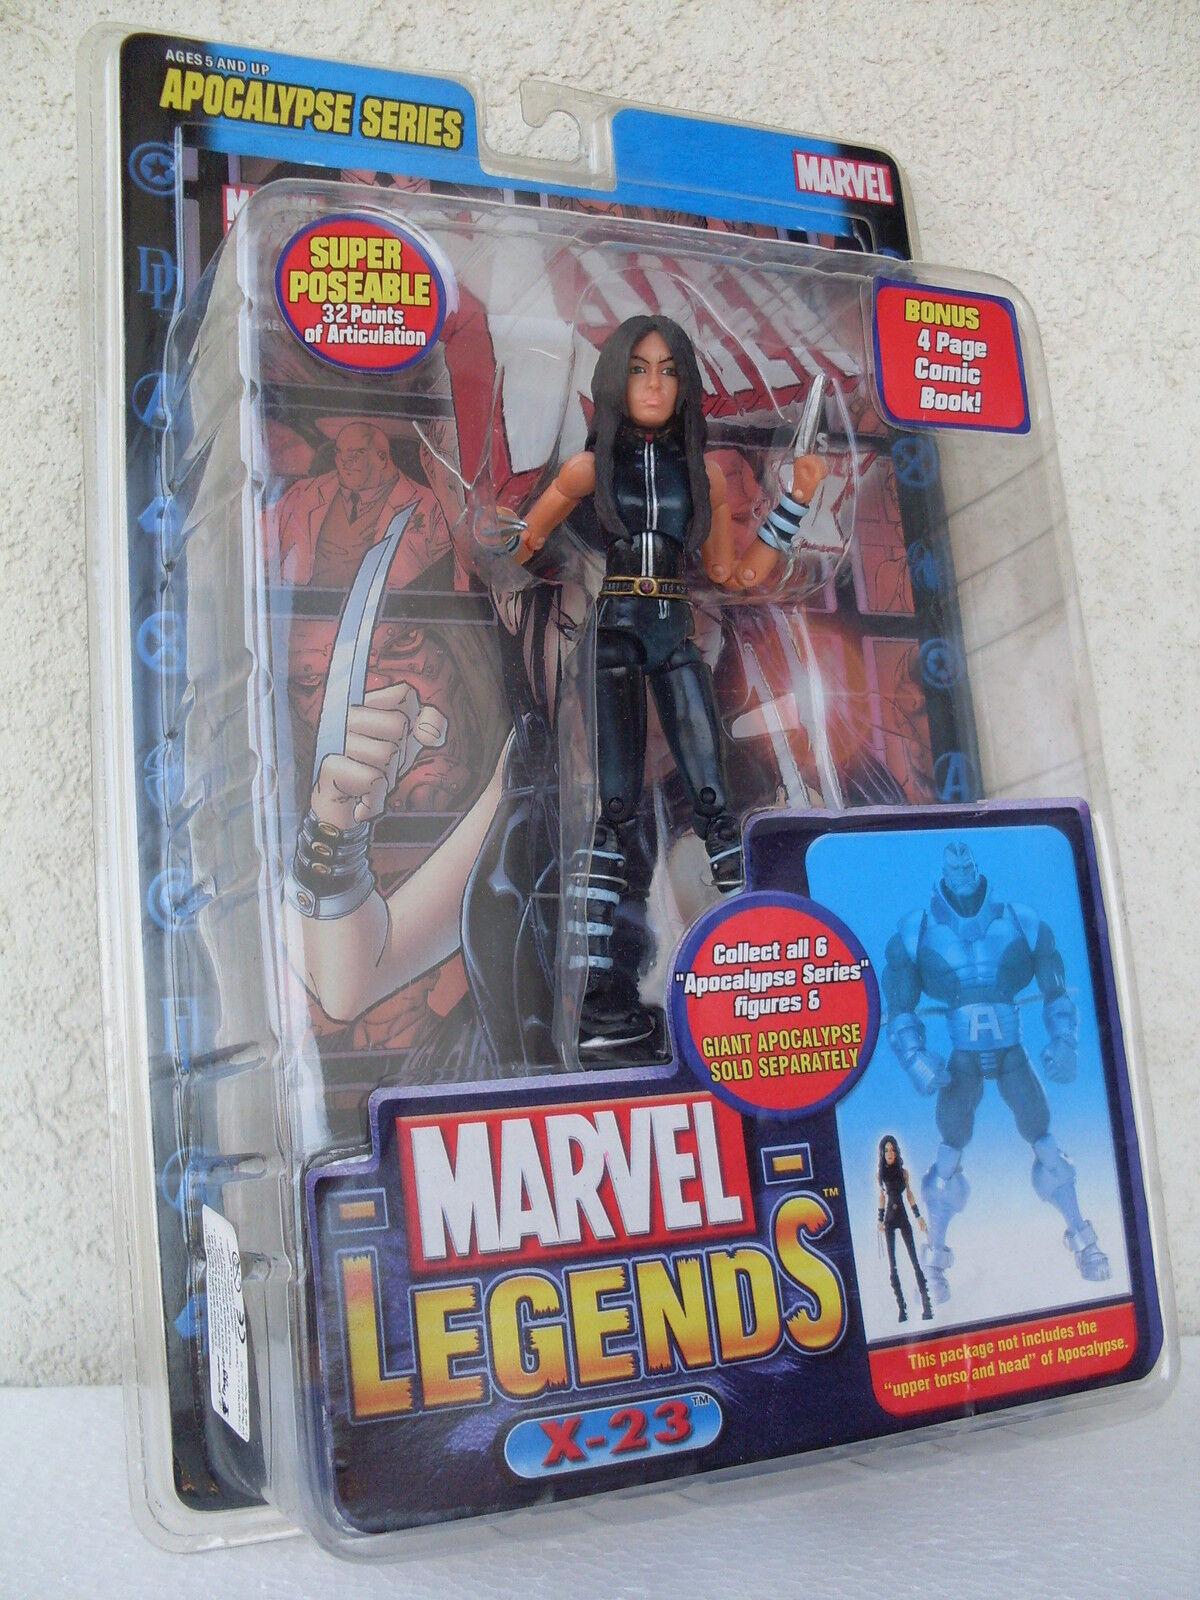 X 23 action figure apocalypse series poseable comic book marvel legends 71143